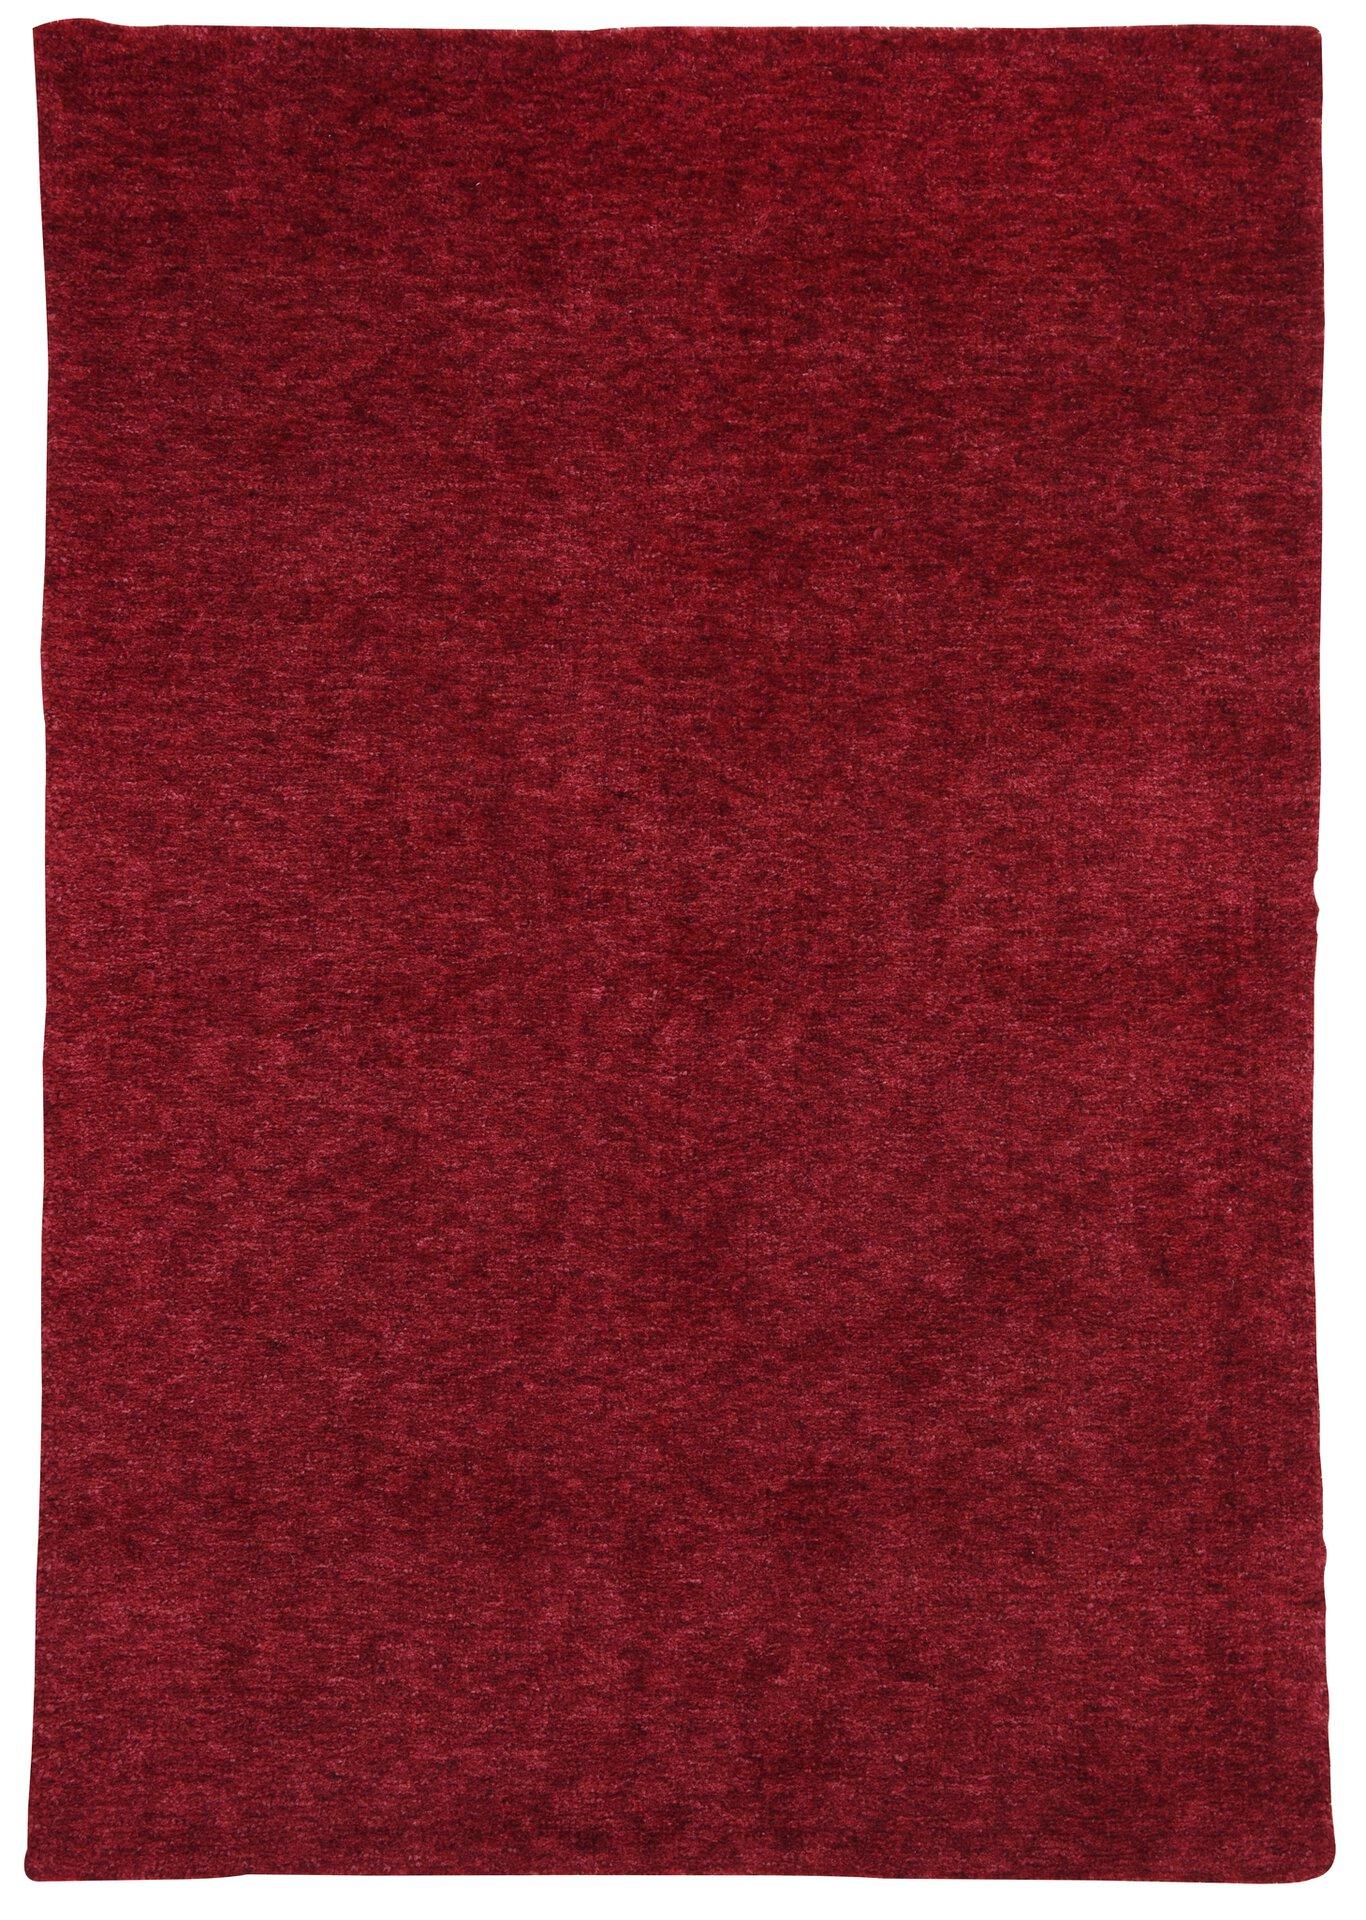 Handtuftteppich Roberto Gino Falcone Textil rot 160 x 230 cm